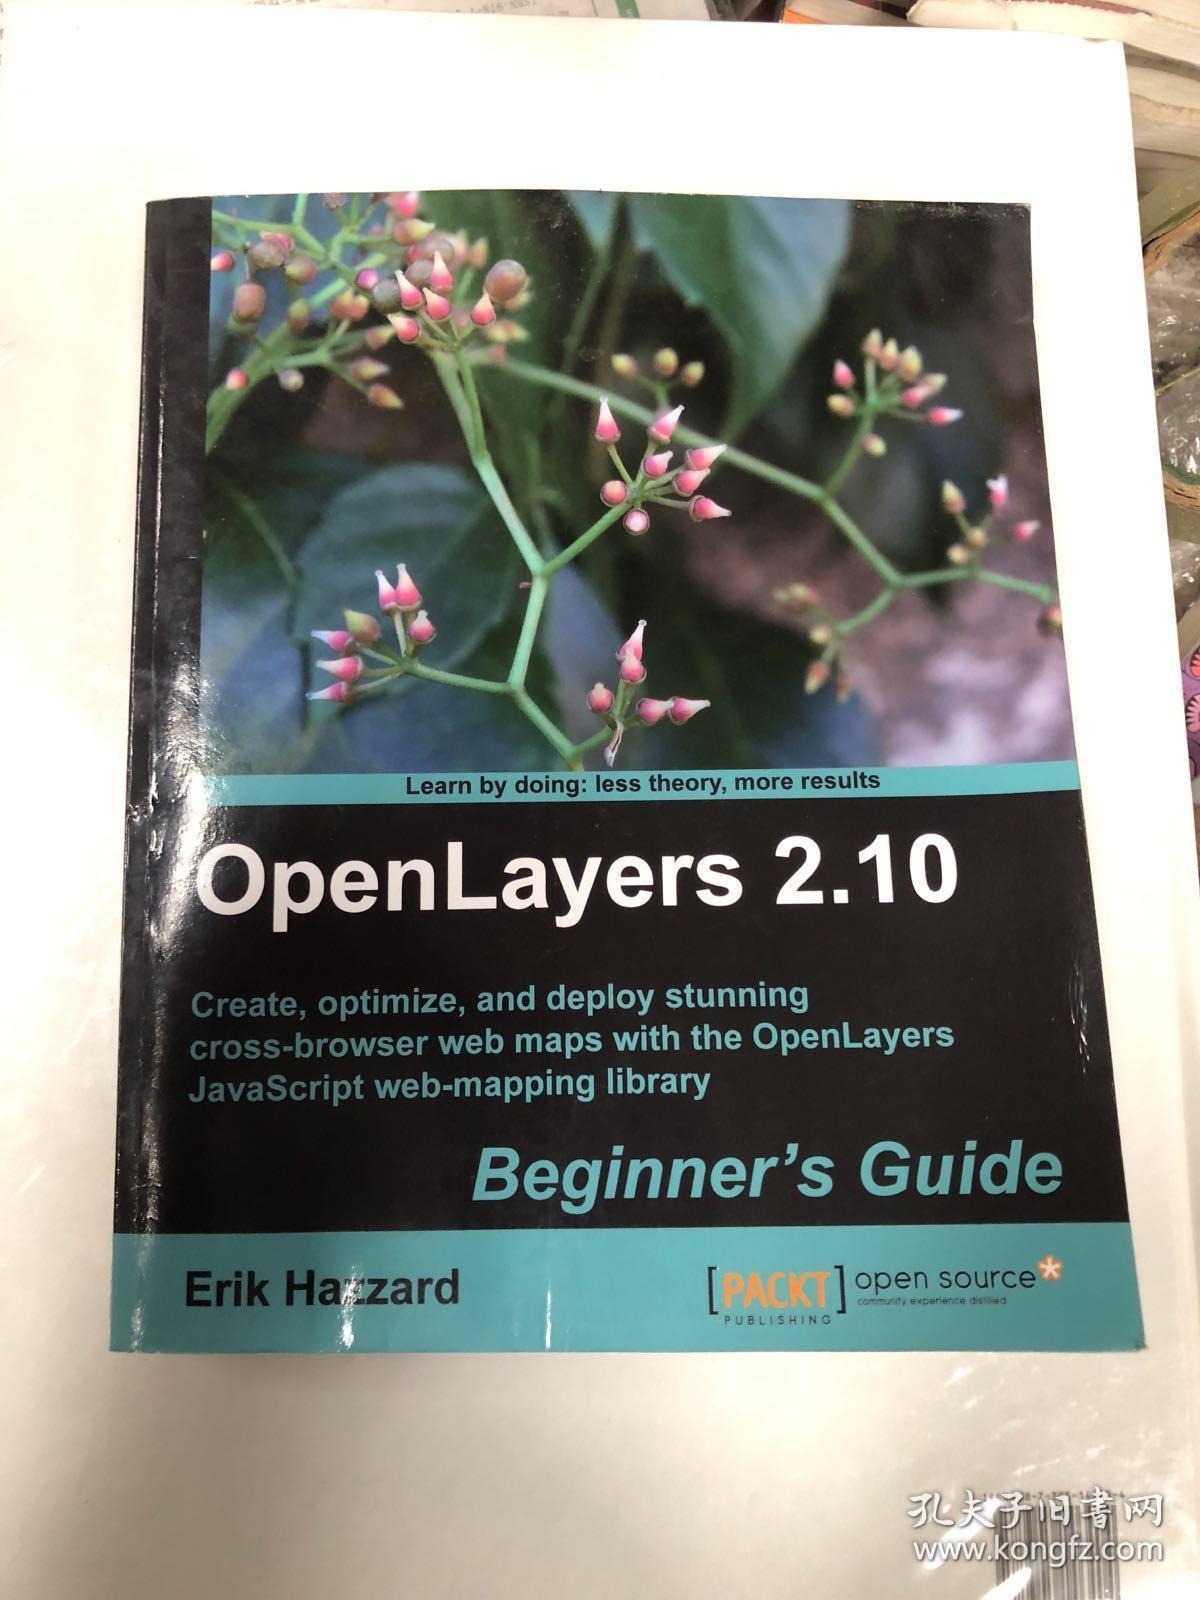 OpenLayers 2.10 Beginner's Guide